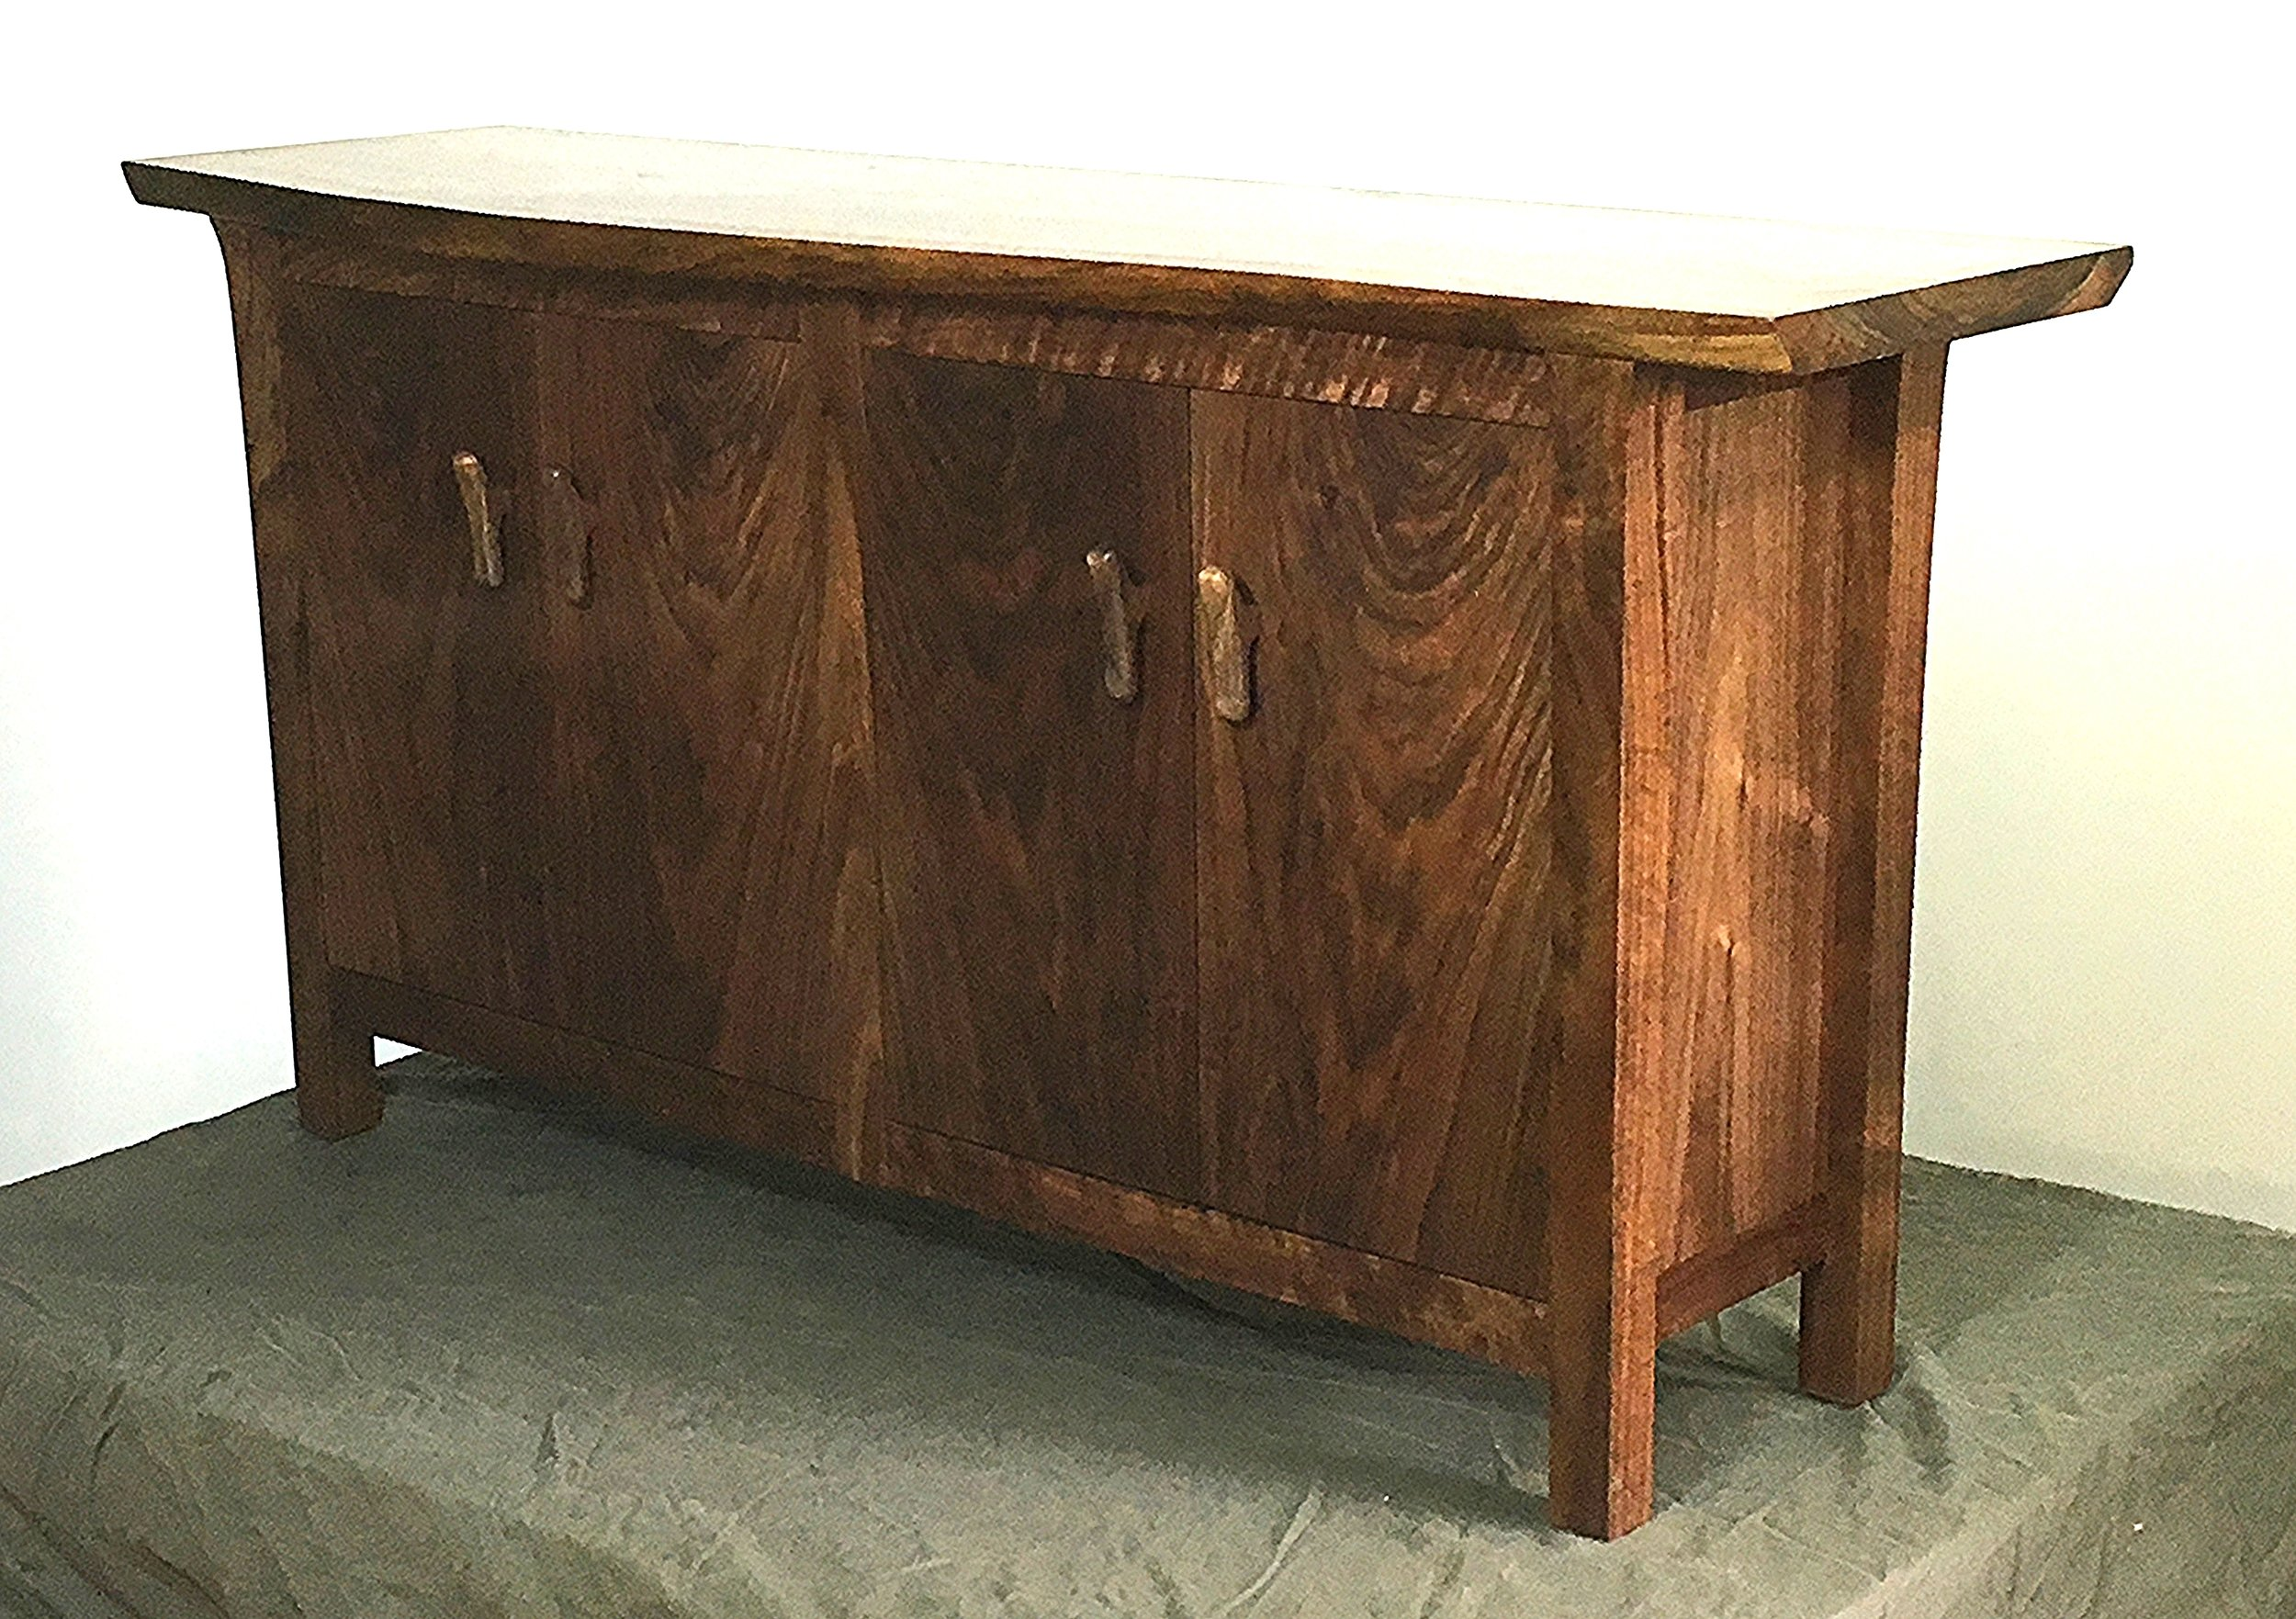 walnut-sideboard-cabinet_25179131430_o.jpg